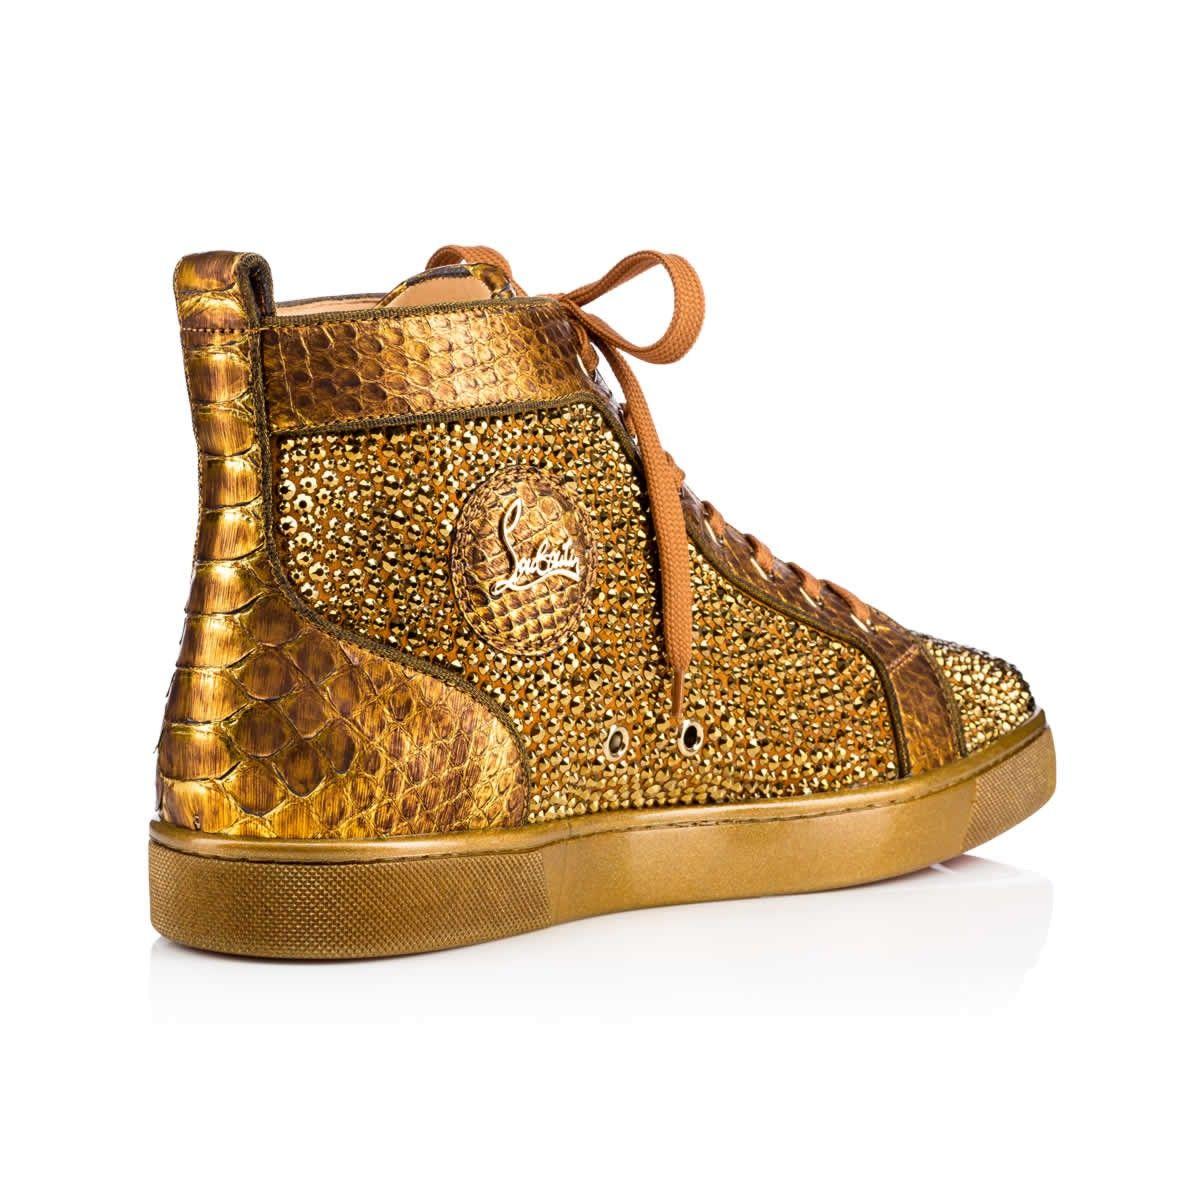 LOUIS VEAU VELOURS/PYTHON/PAVE STRASS Antic Gold Python - Men Shoes - Christian  Louboutin